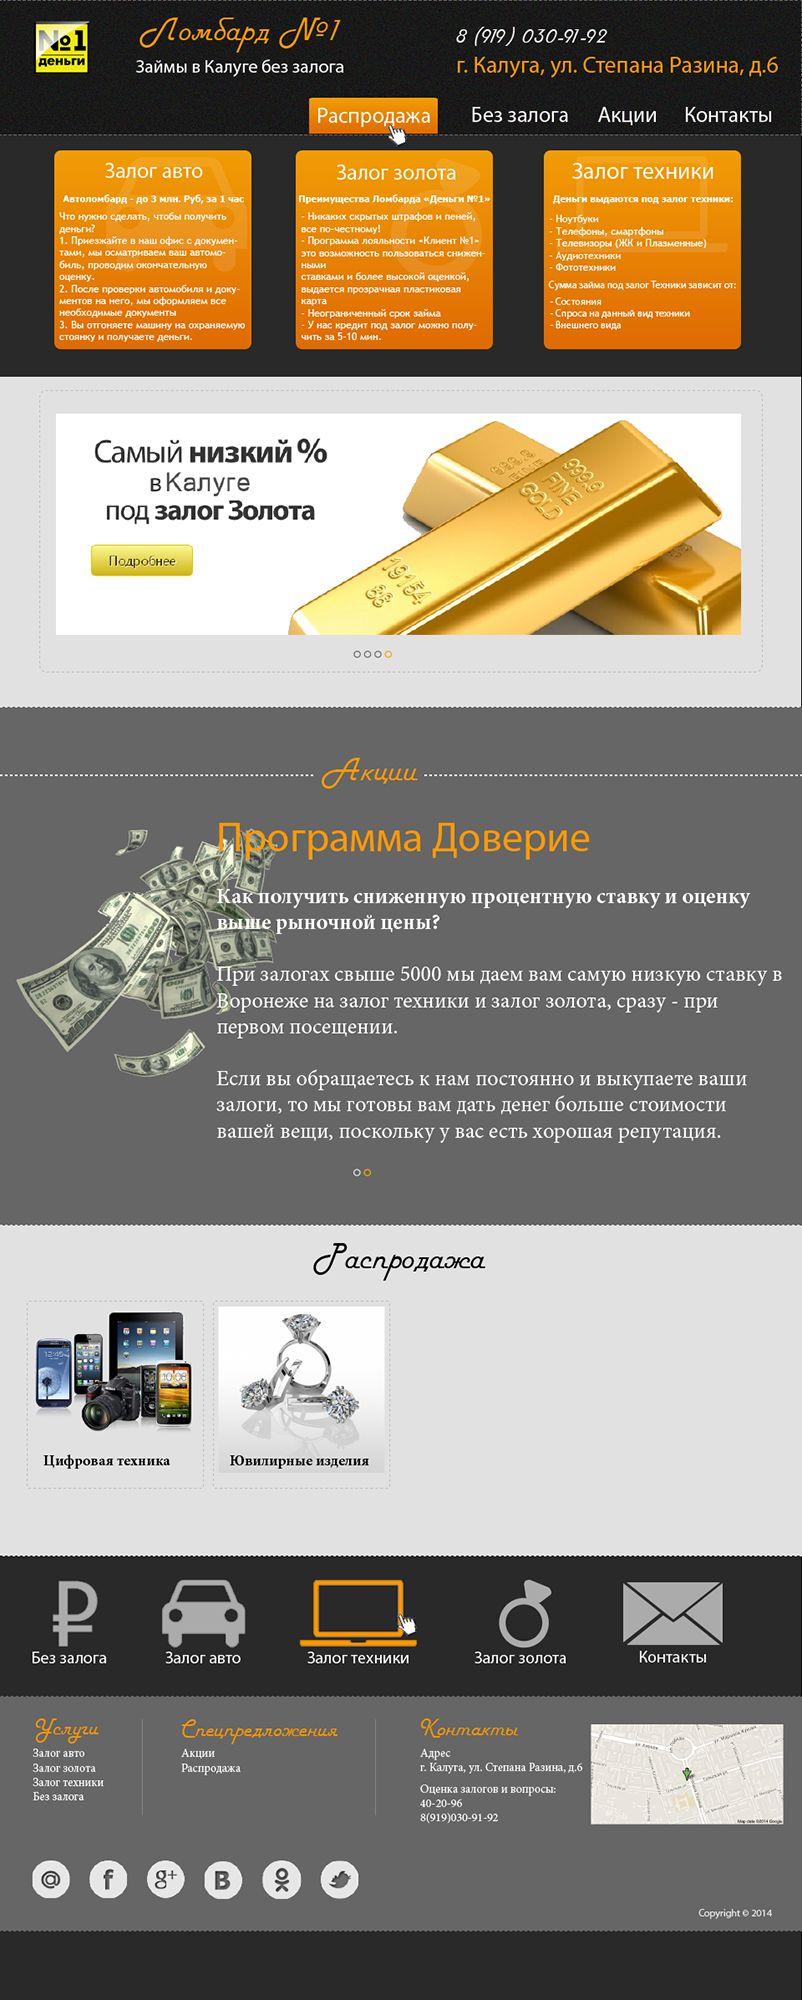 Дизайн главной страницы сайта Ломбард №1 - дизайнер MakcPetrov